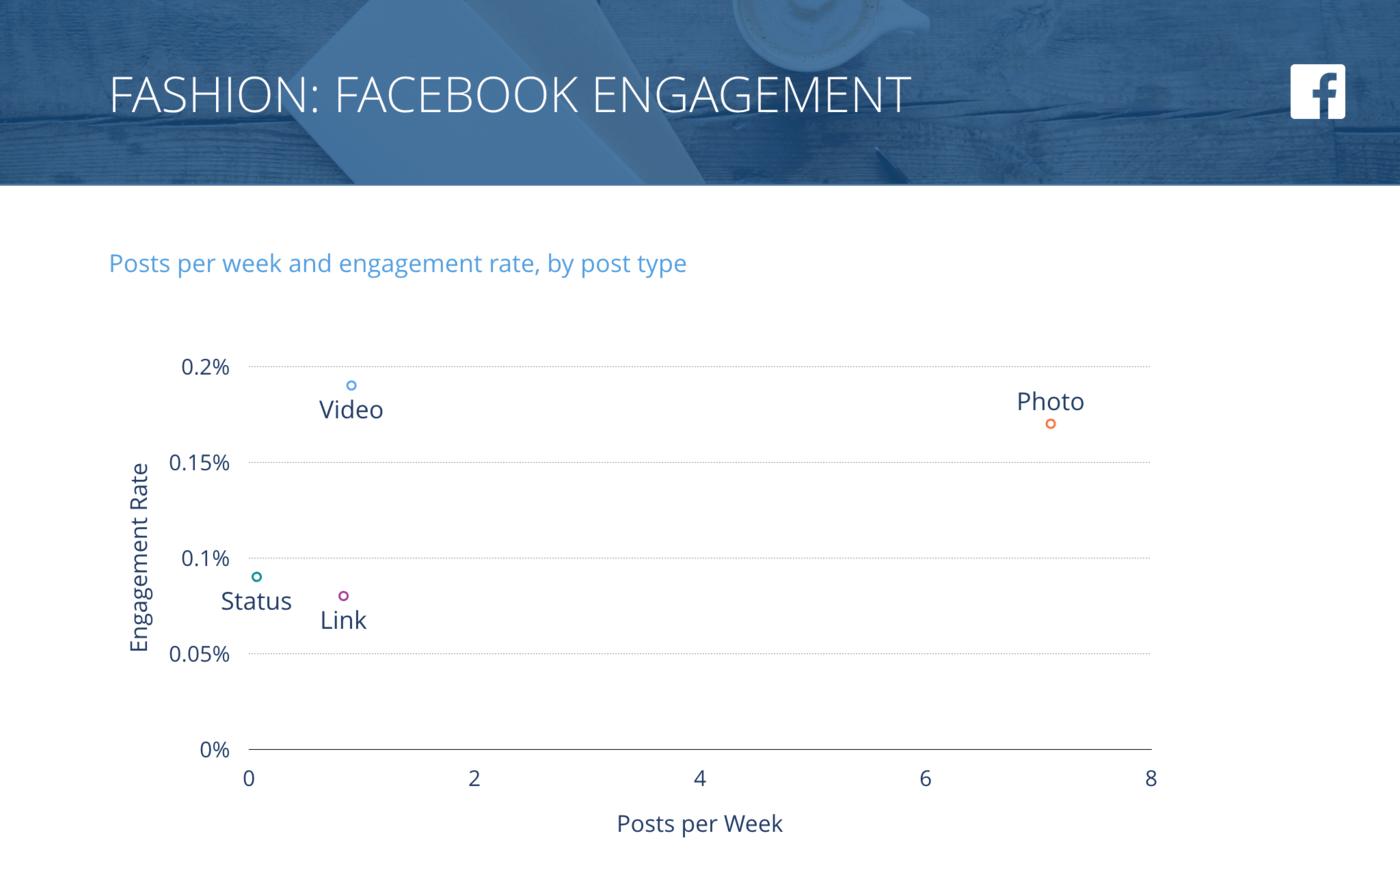 slide for Facebook Posts per Week vs. Engagement Rate per Post, Fashion Brands